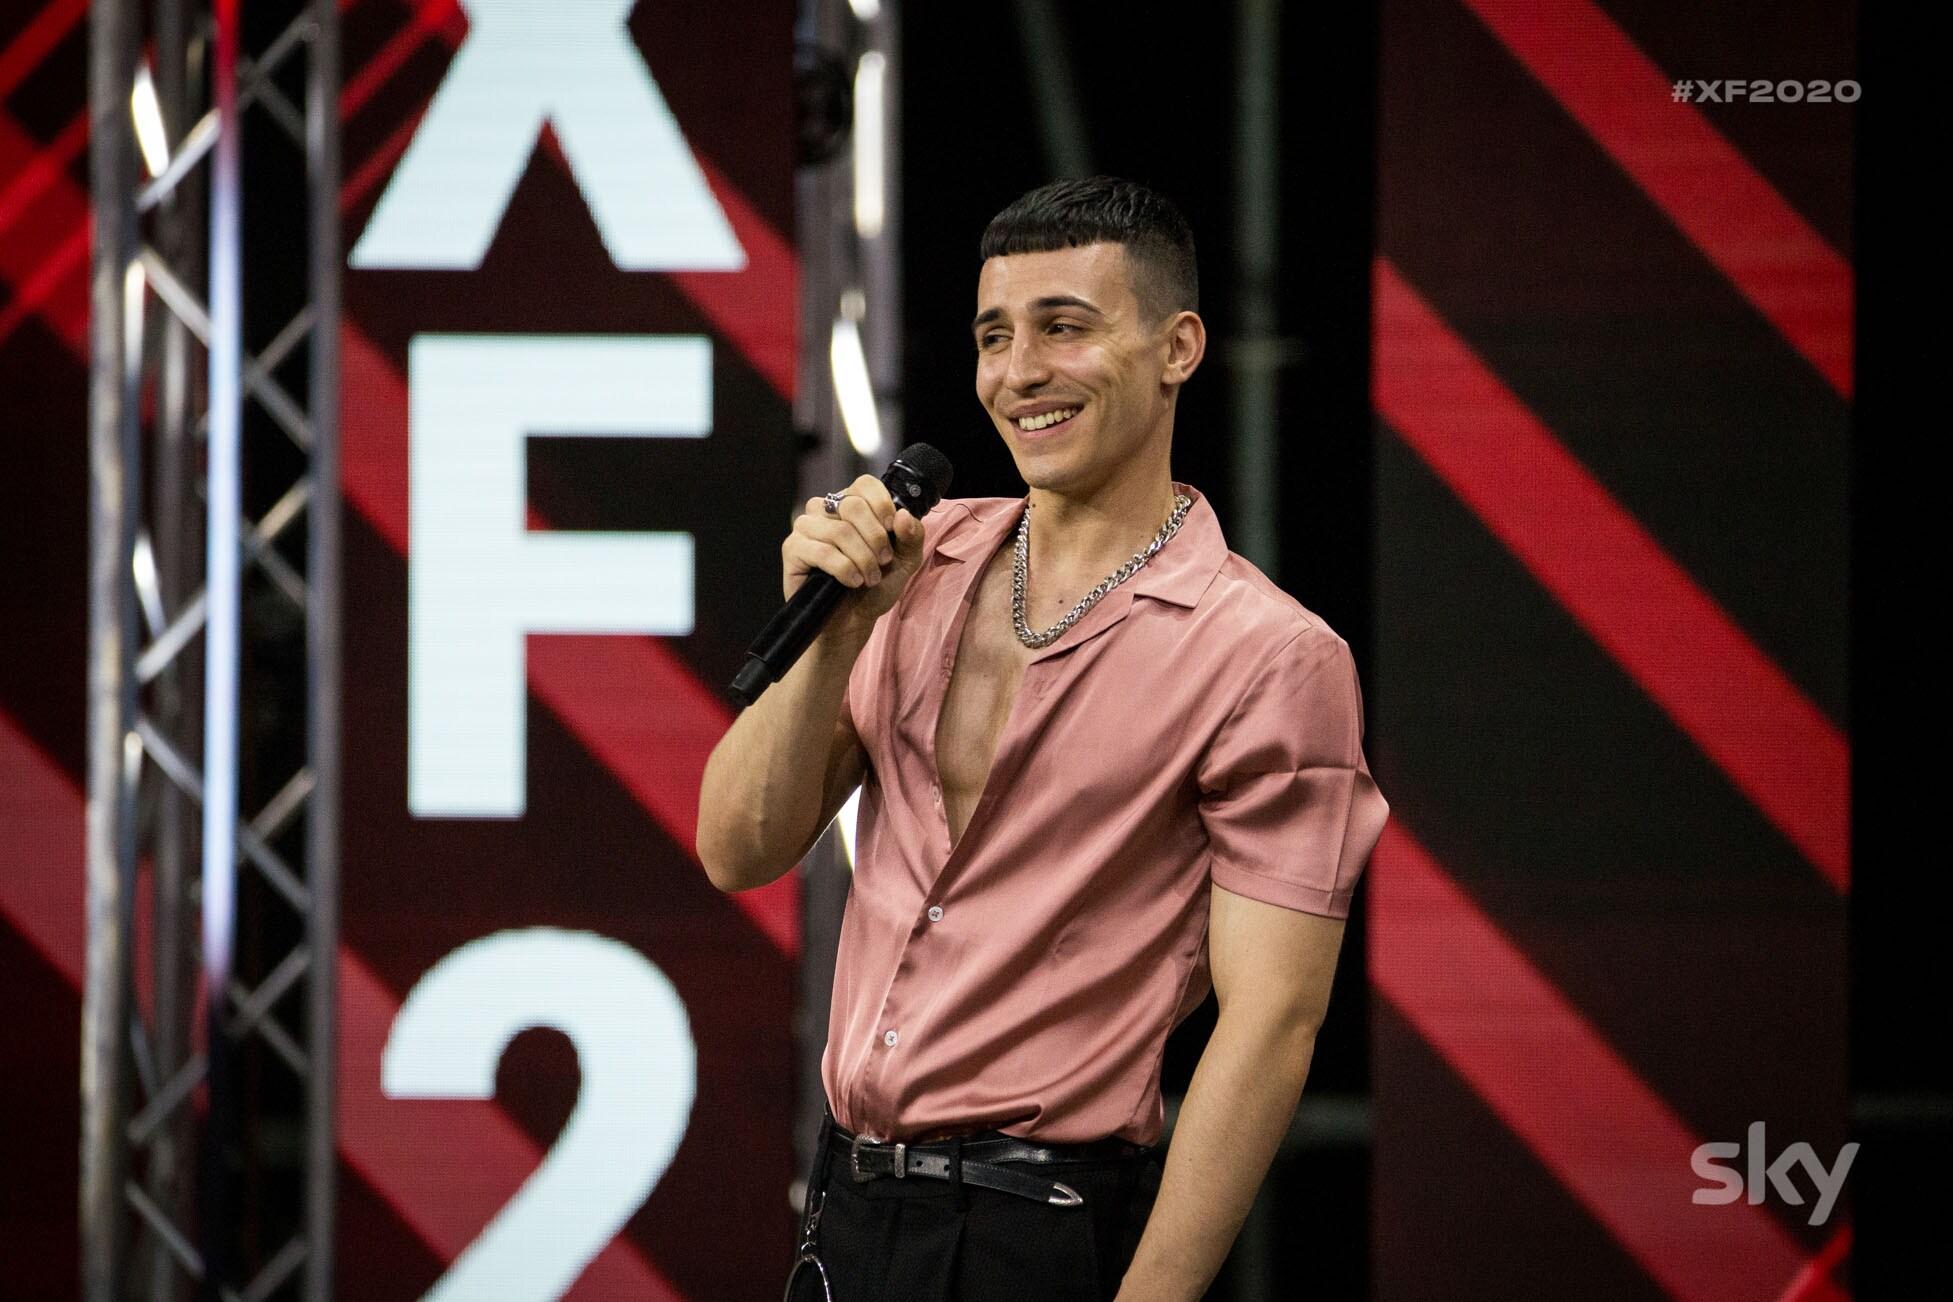 X Factor 2020, Vergo canta Malika e fa sul serio - Flipboard